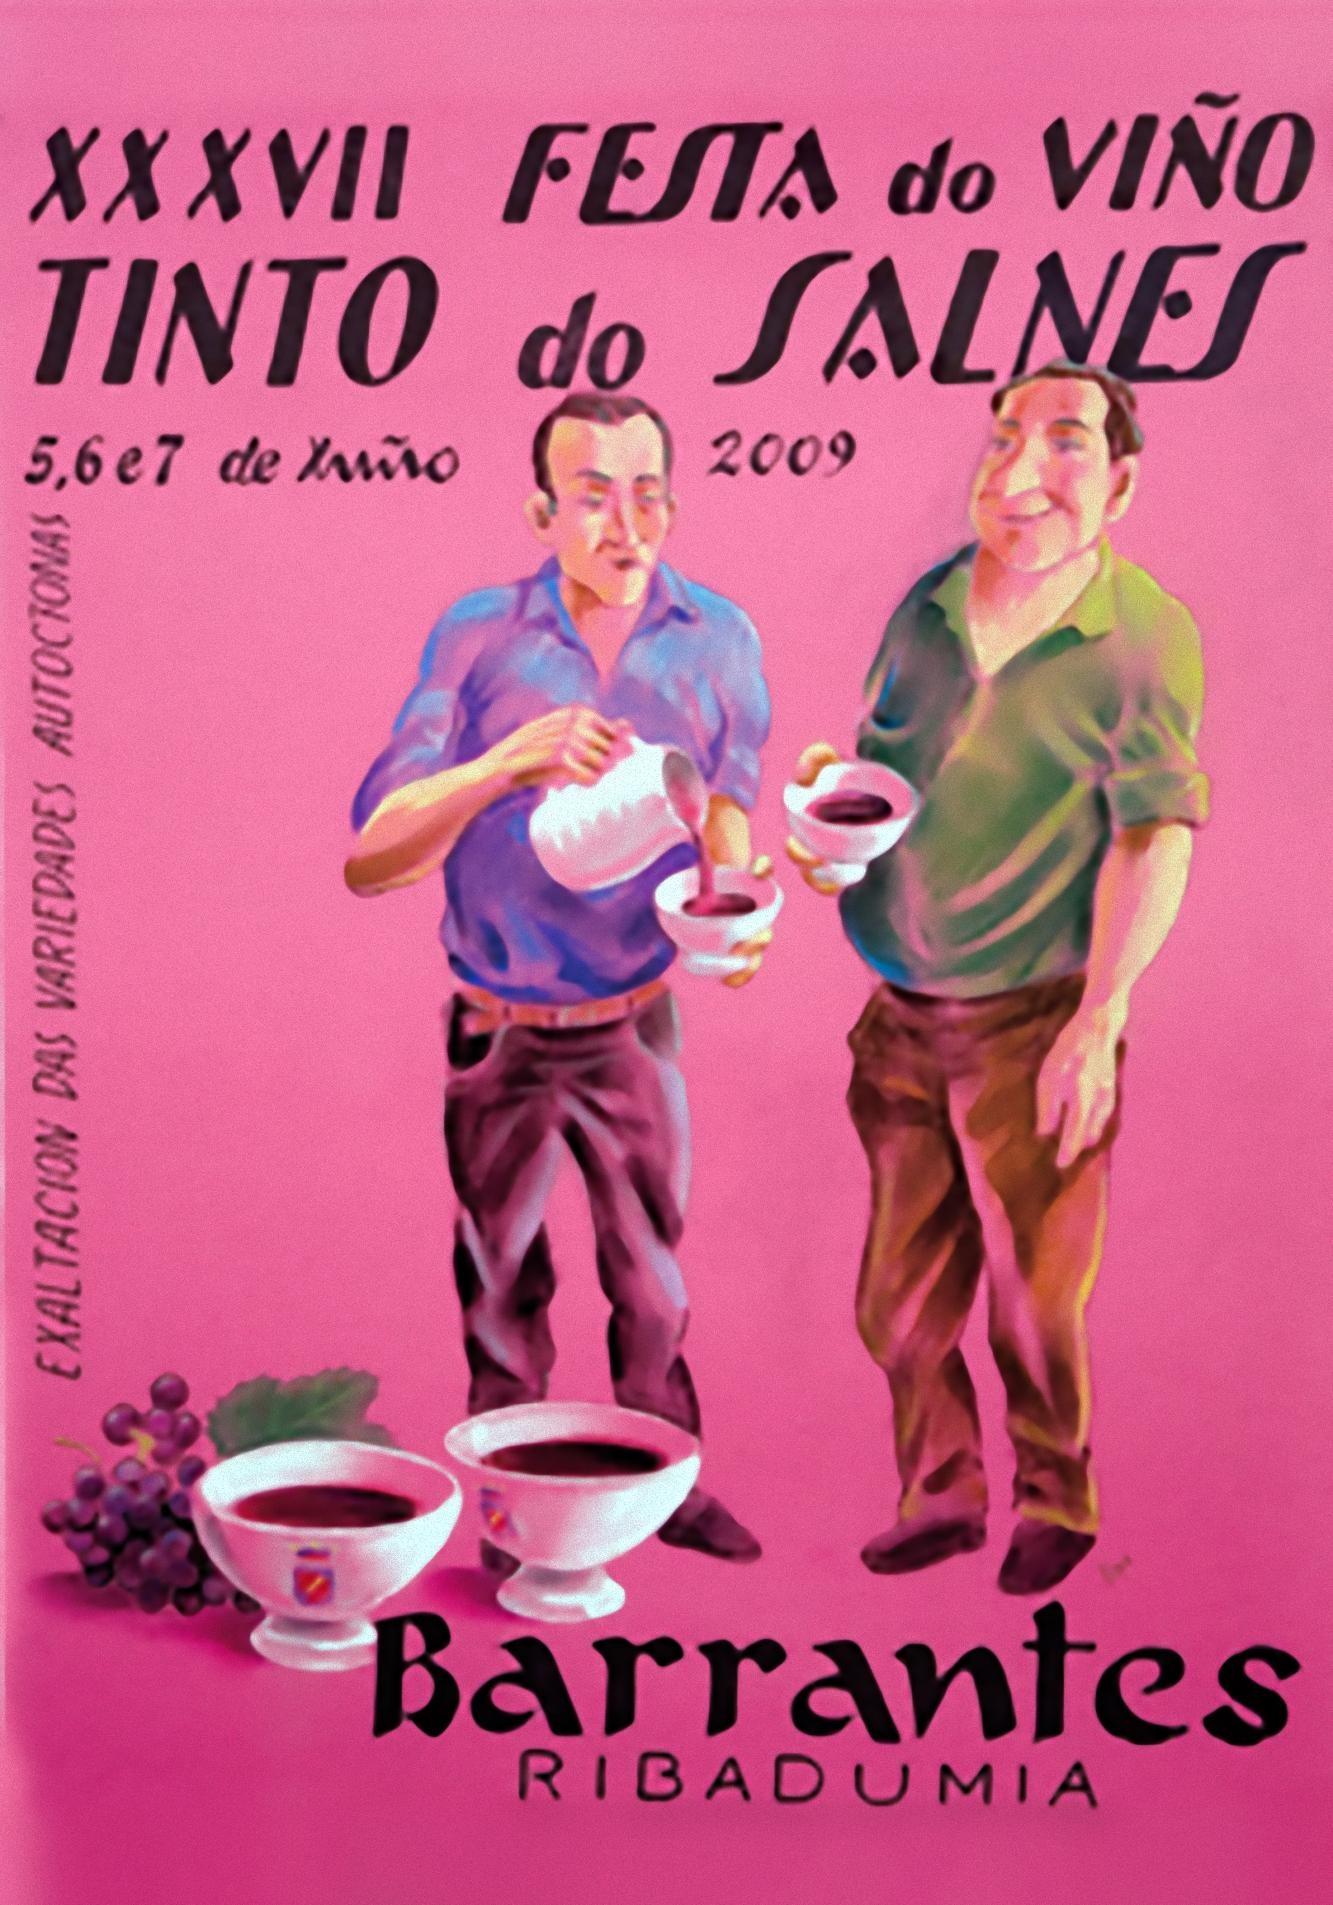 Fiesta del Vino Tinto del Salnés